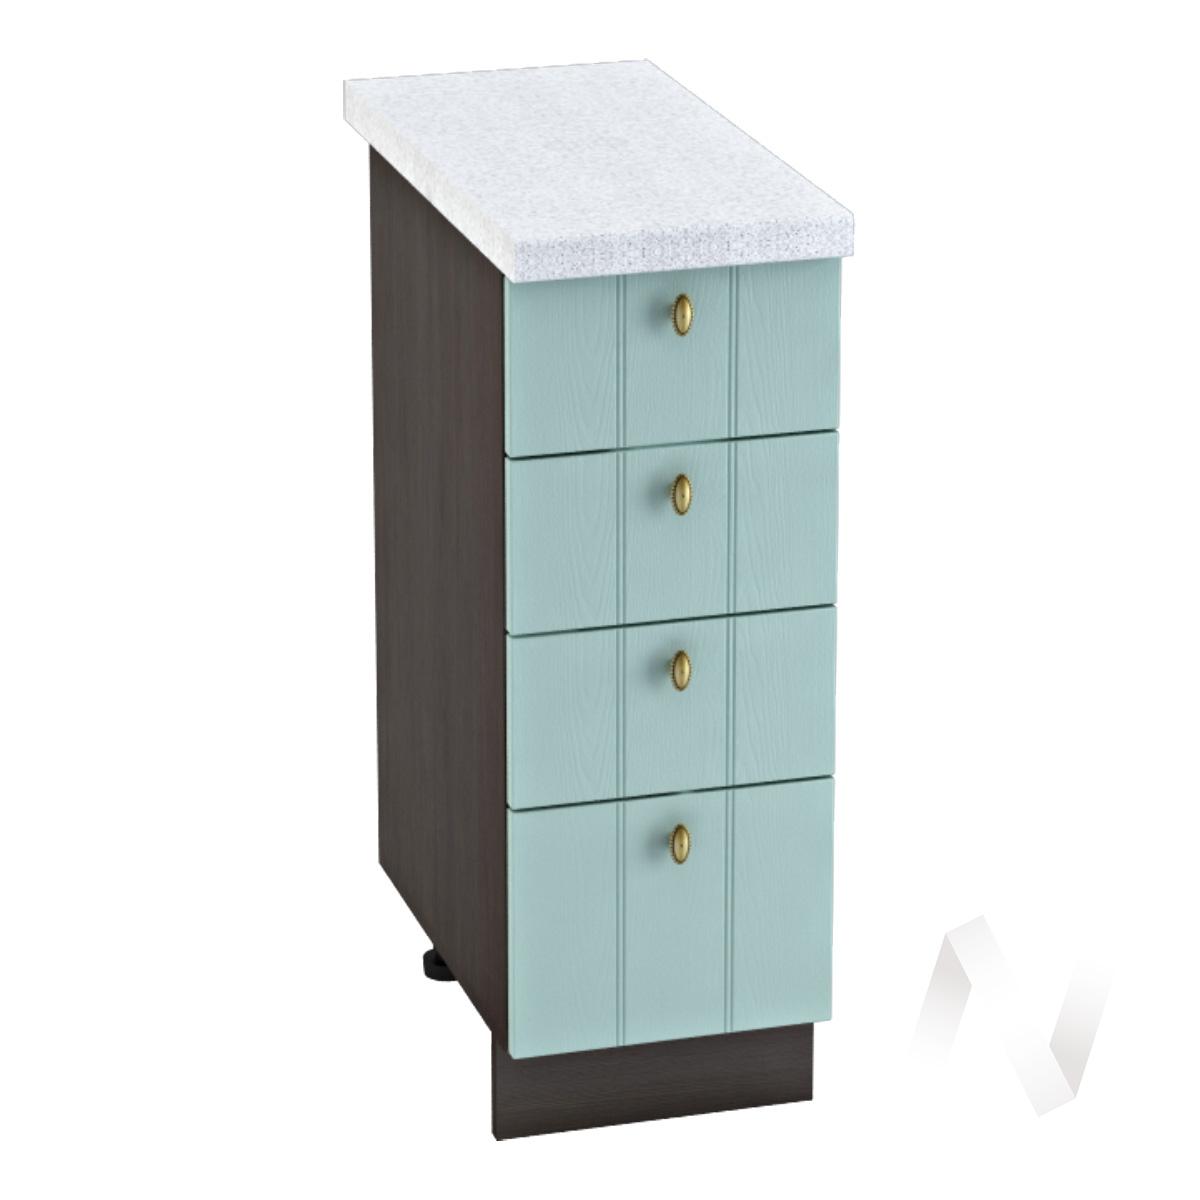 "Кухня ""Прованс"": Шкаф нижний с 4-мя ящиками 300, ШН4Я 300 (голубой/корпус венге)"